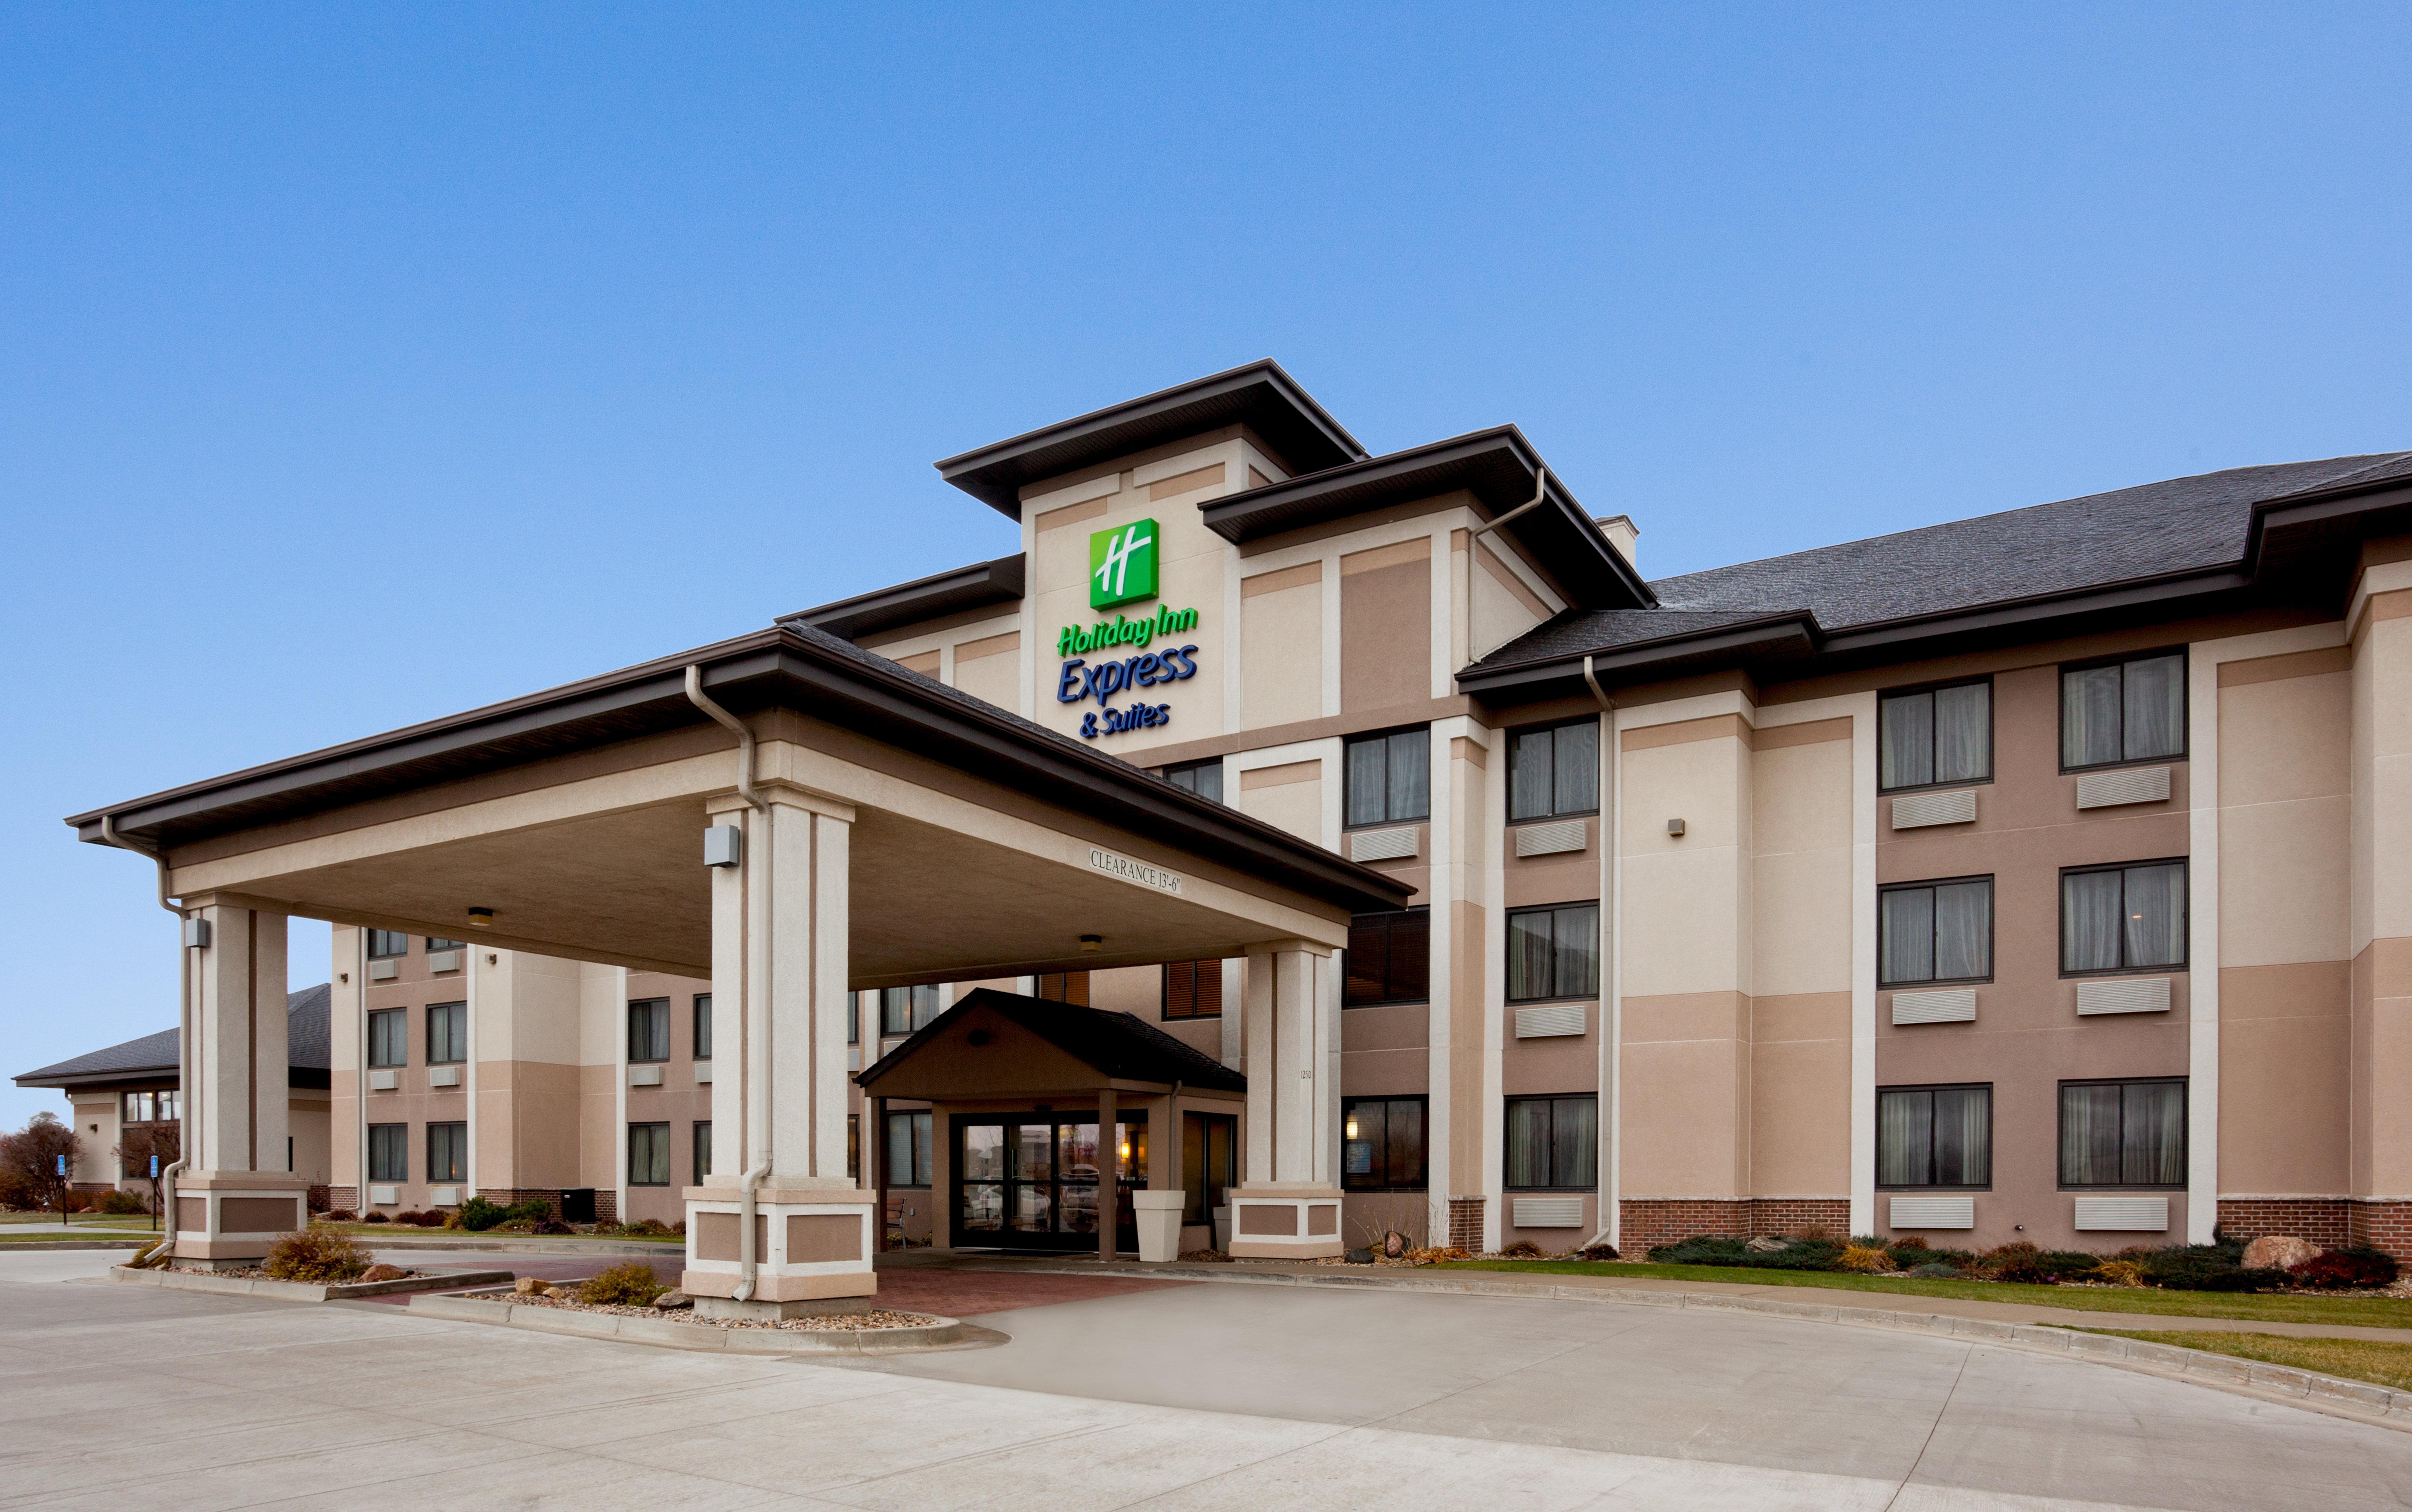 Holiday Inn Express & Suites Worthington